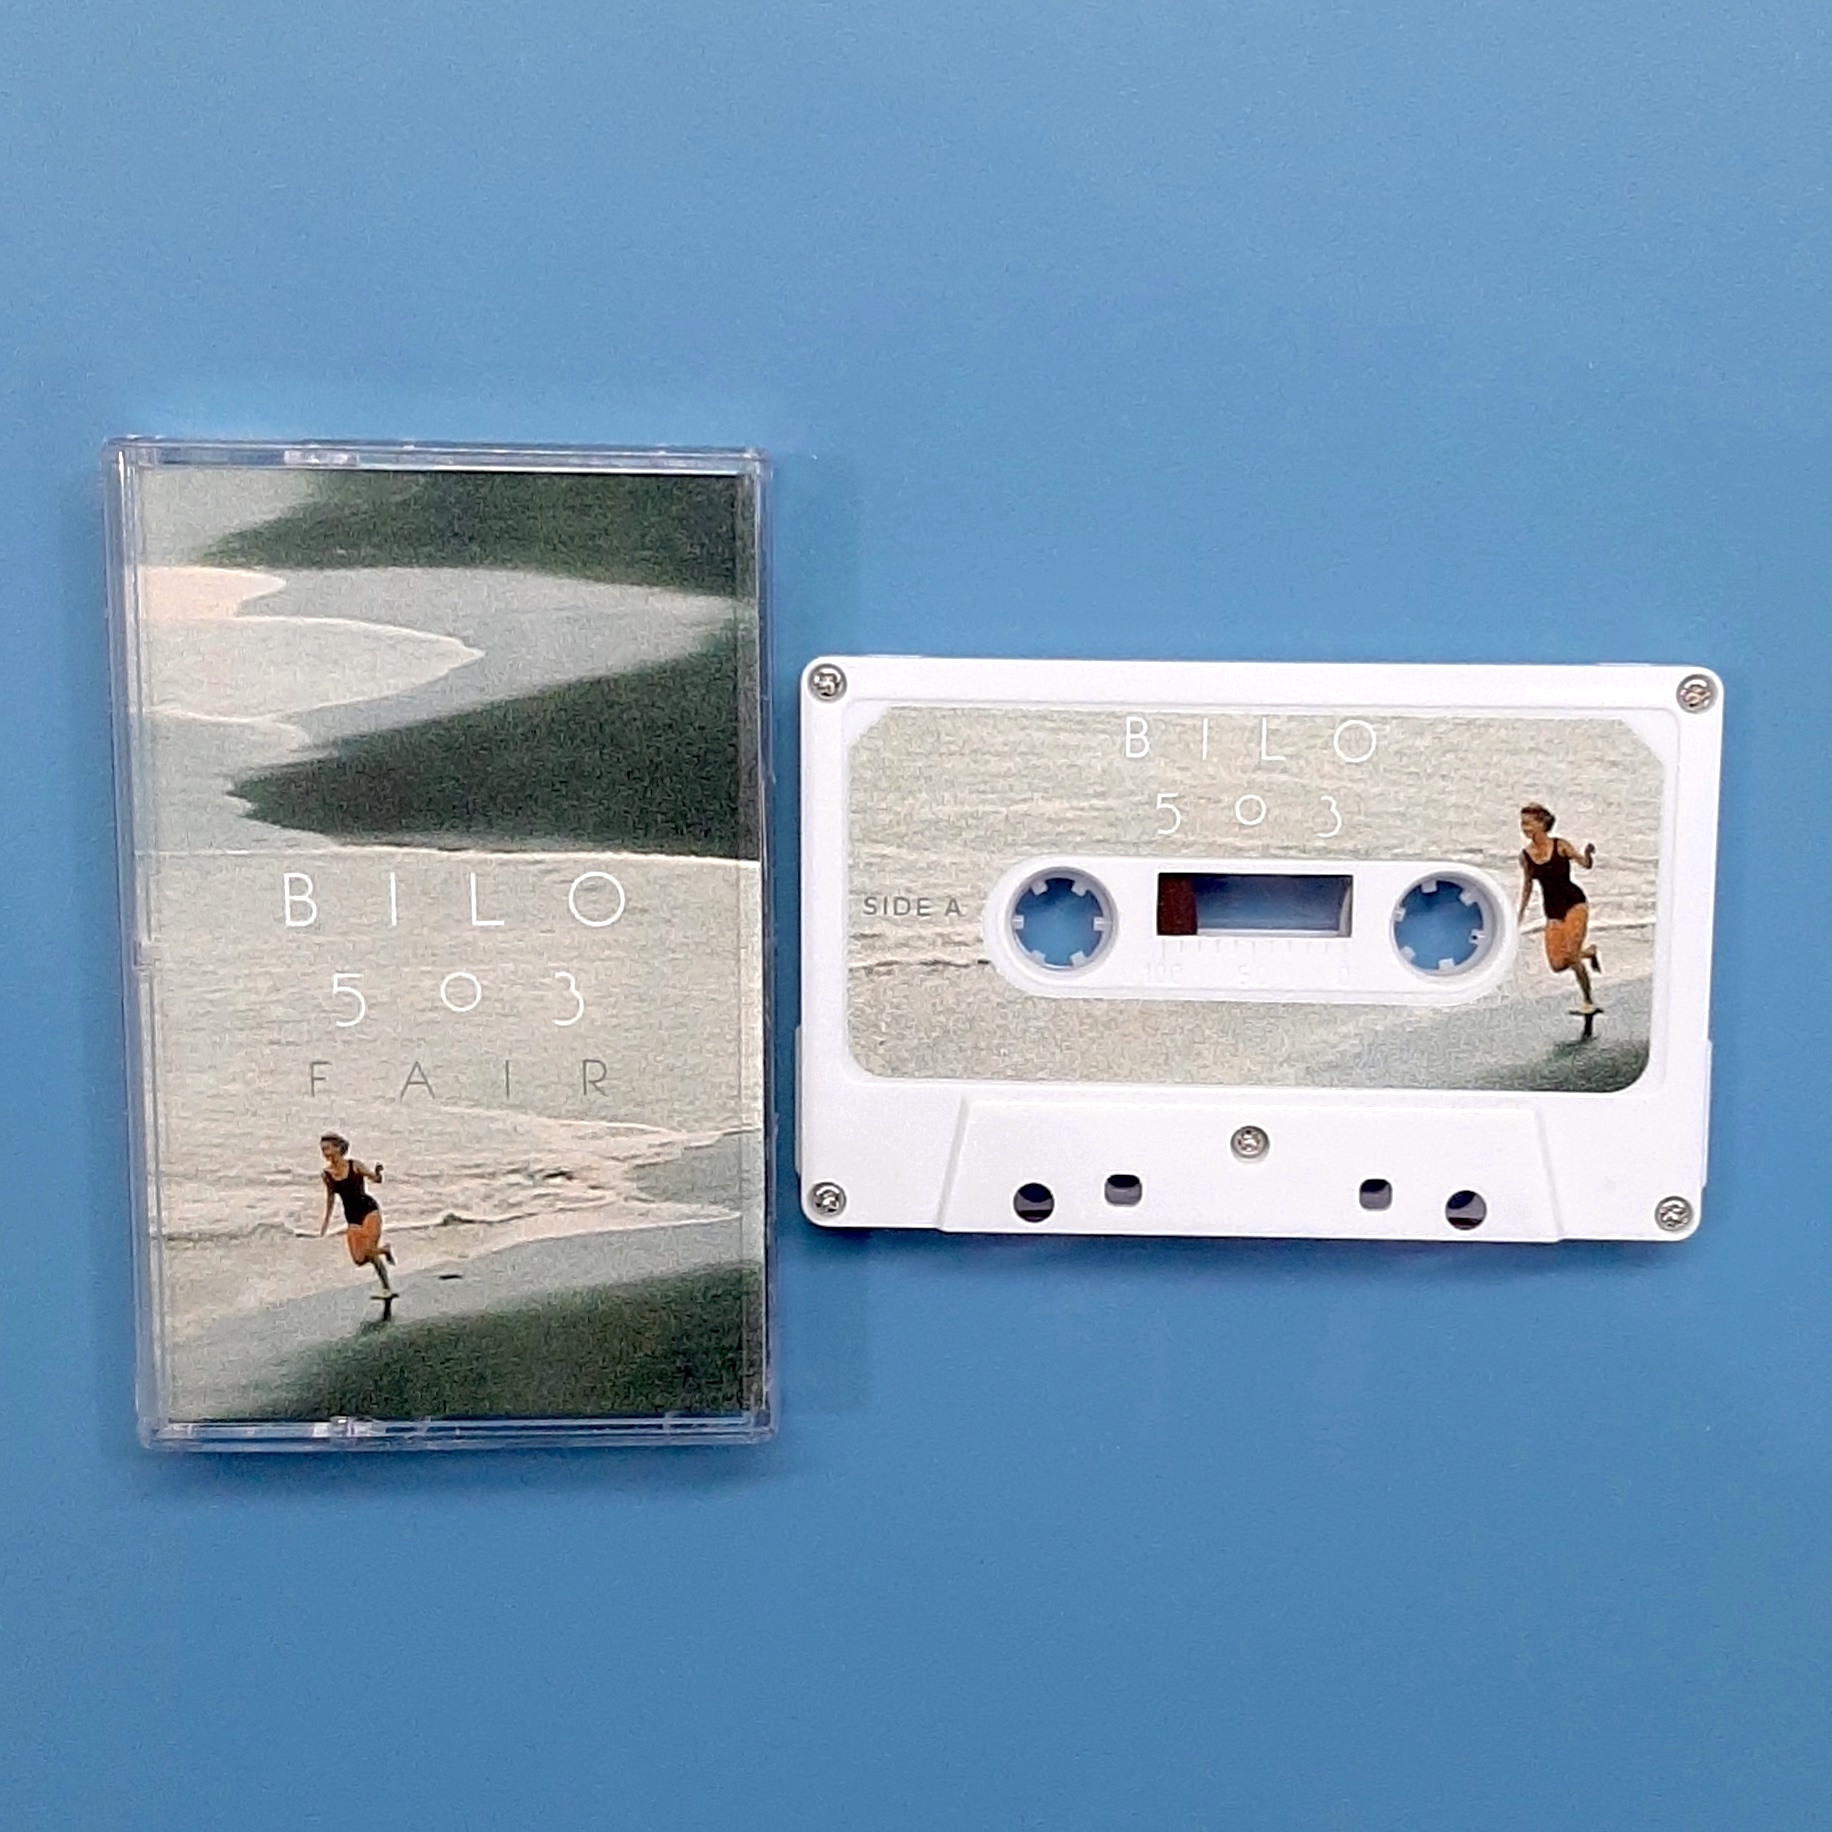 Bilo 503 - Fair (Inner Ocean Records)